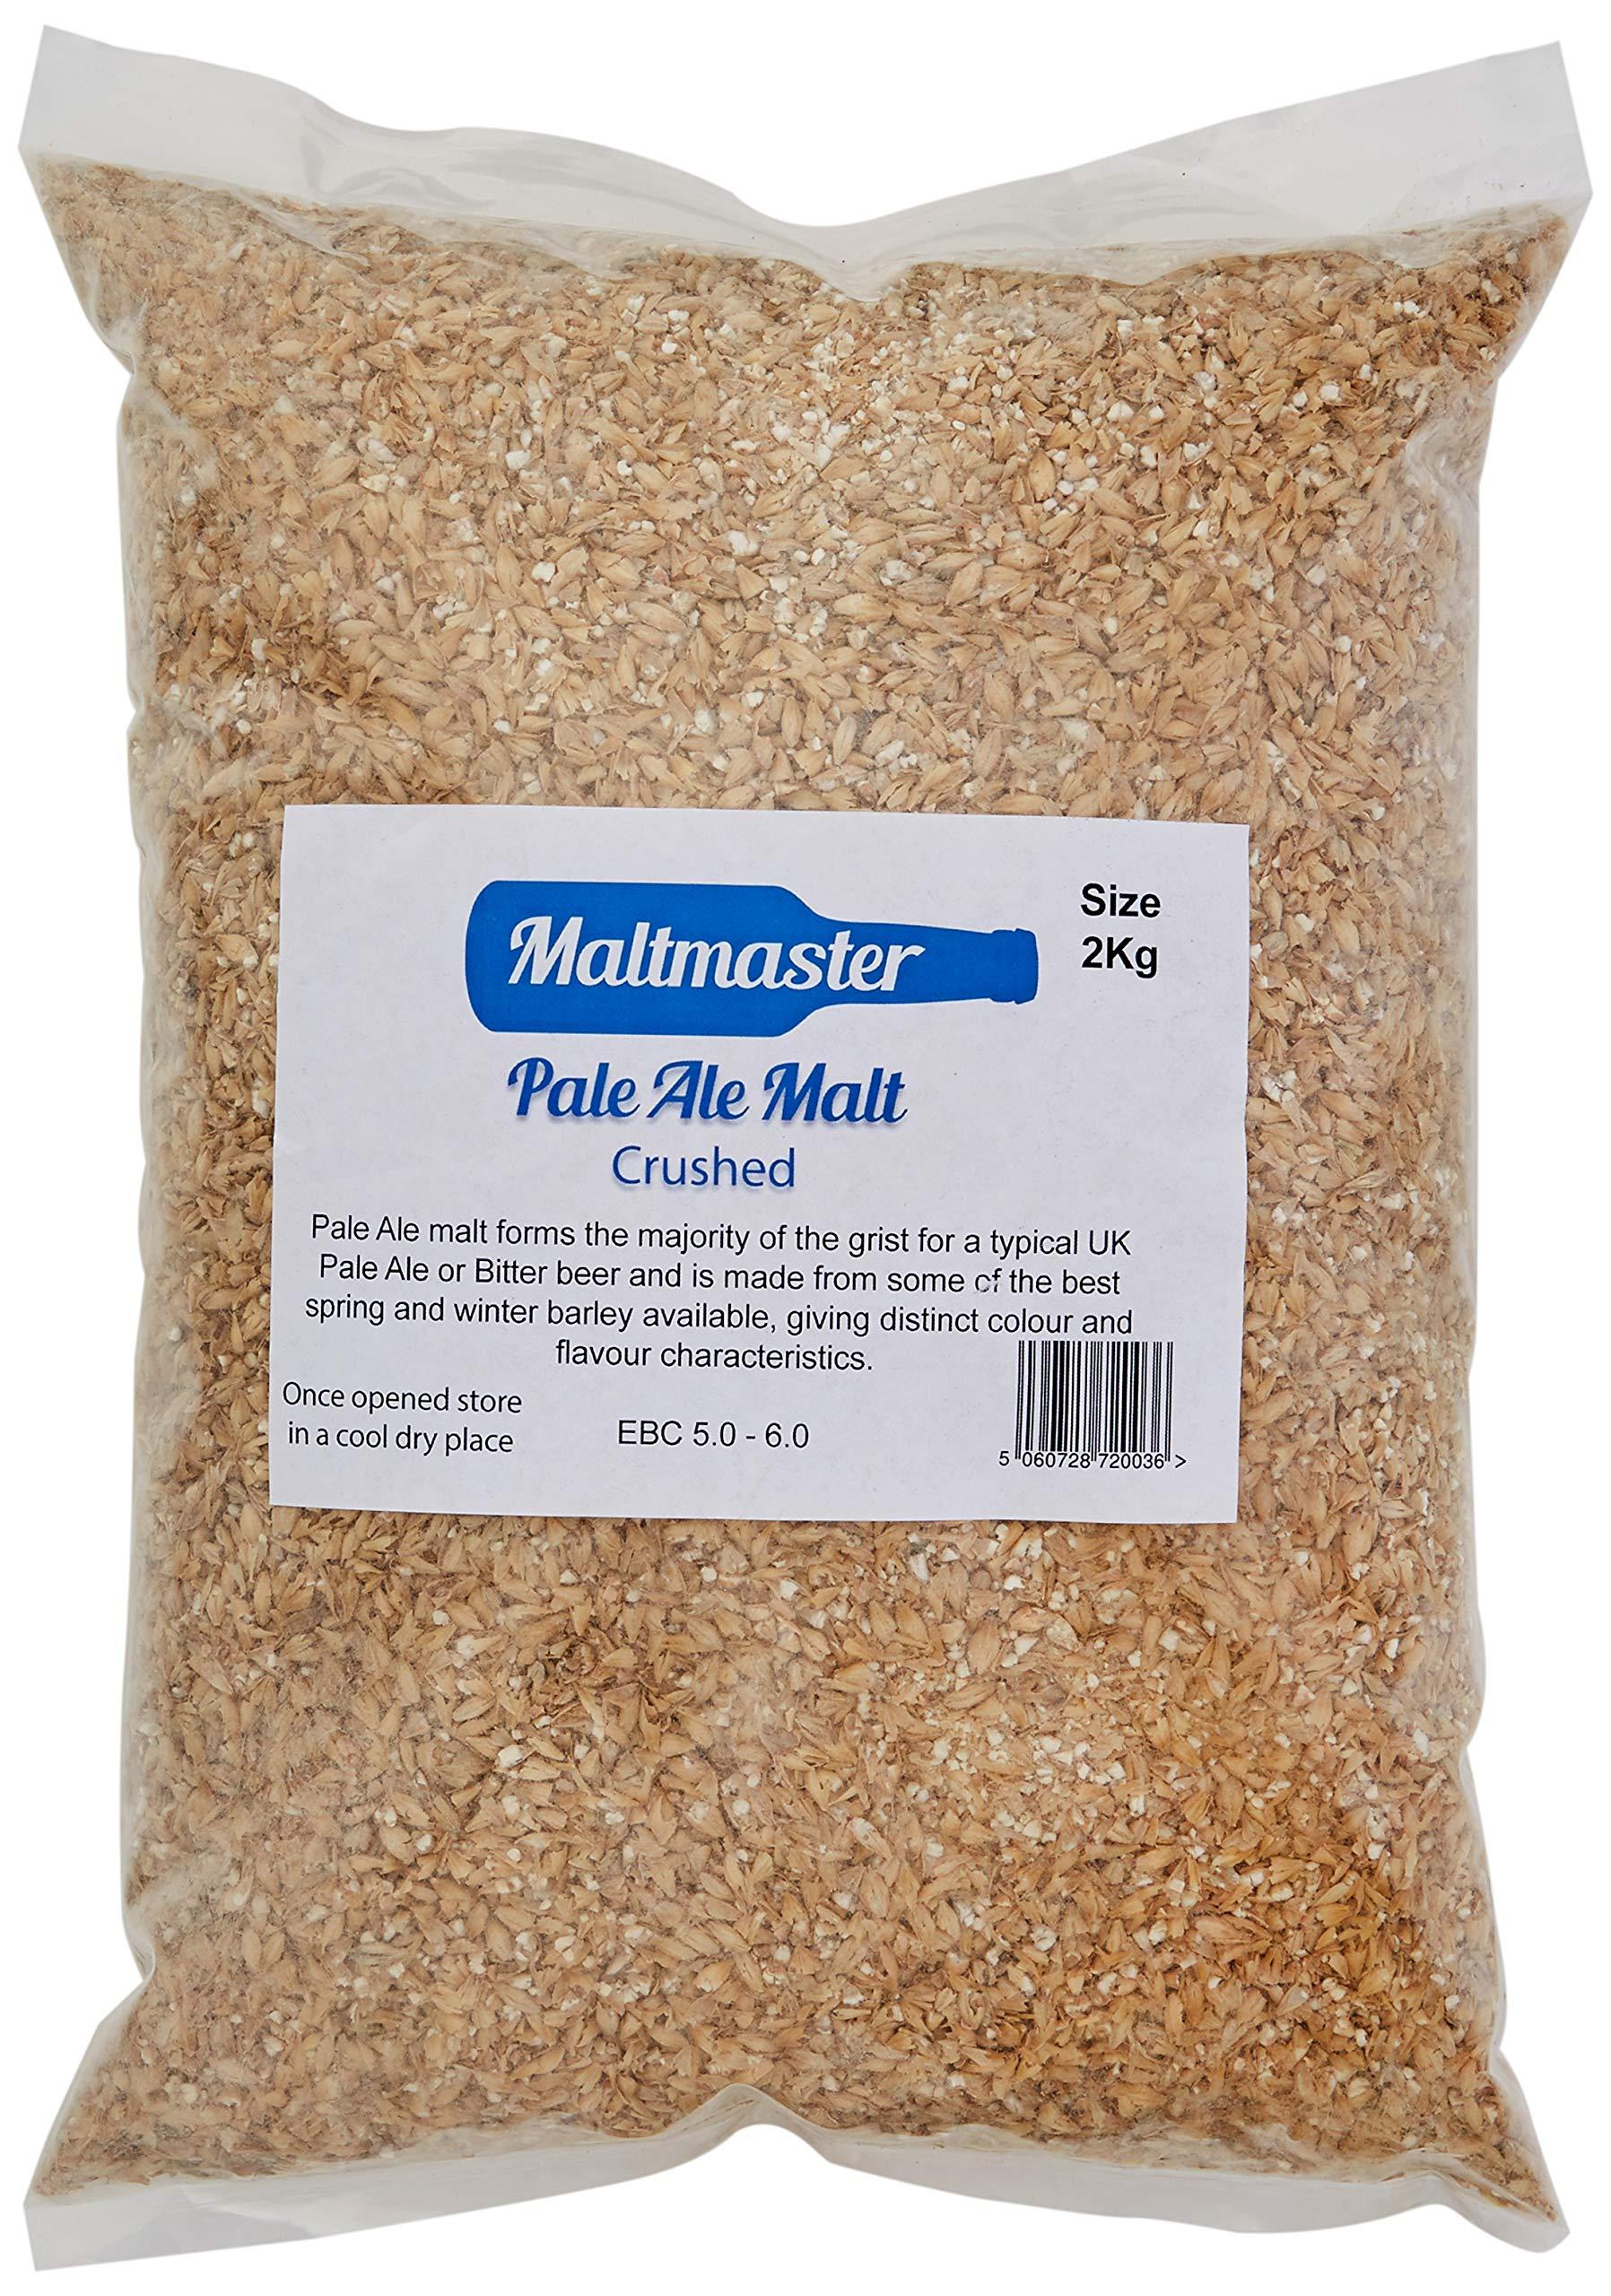 House of Handicrafts Maltmaster Pale Ale Malt 2kg